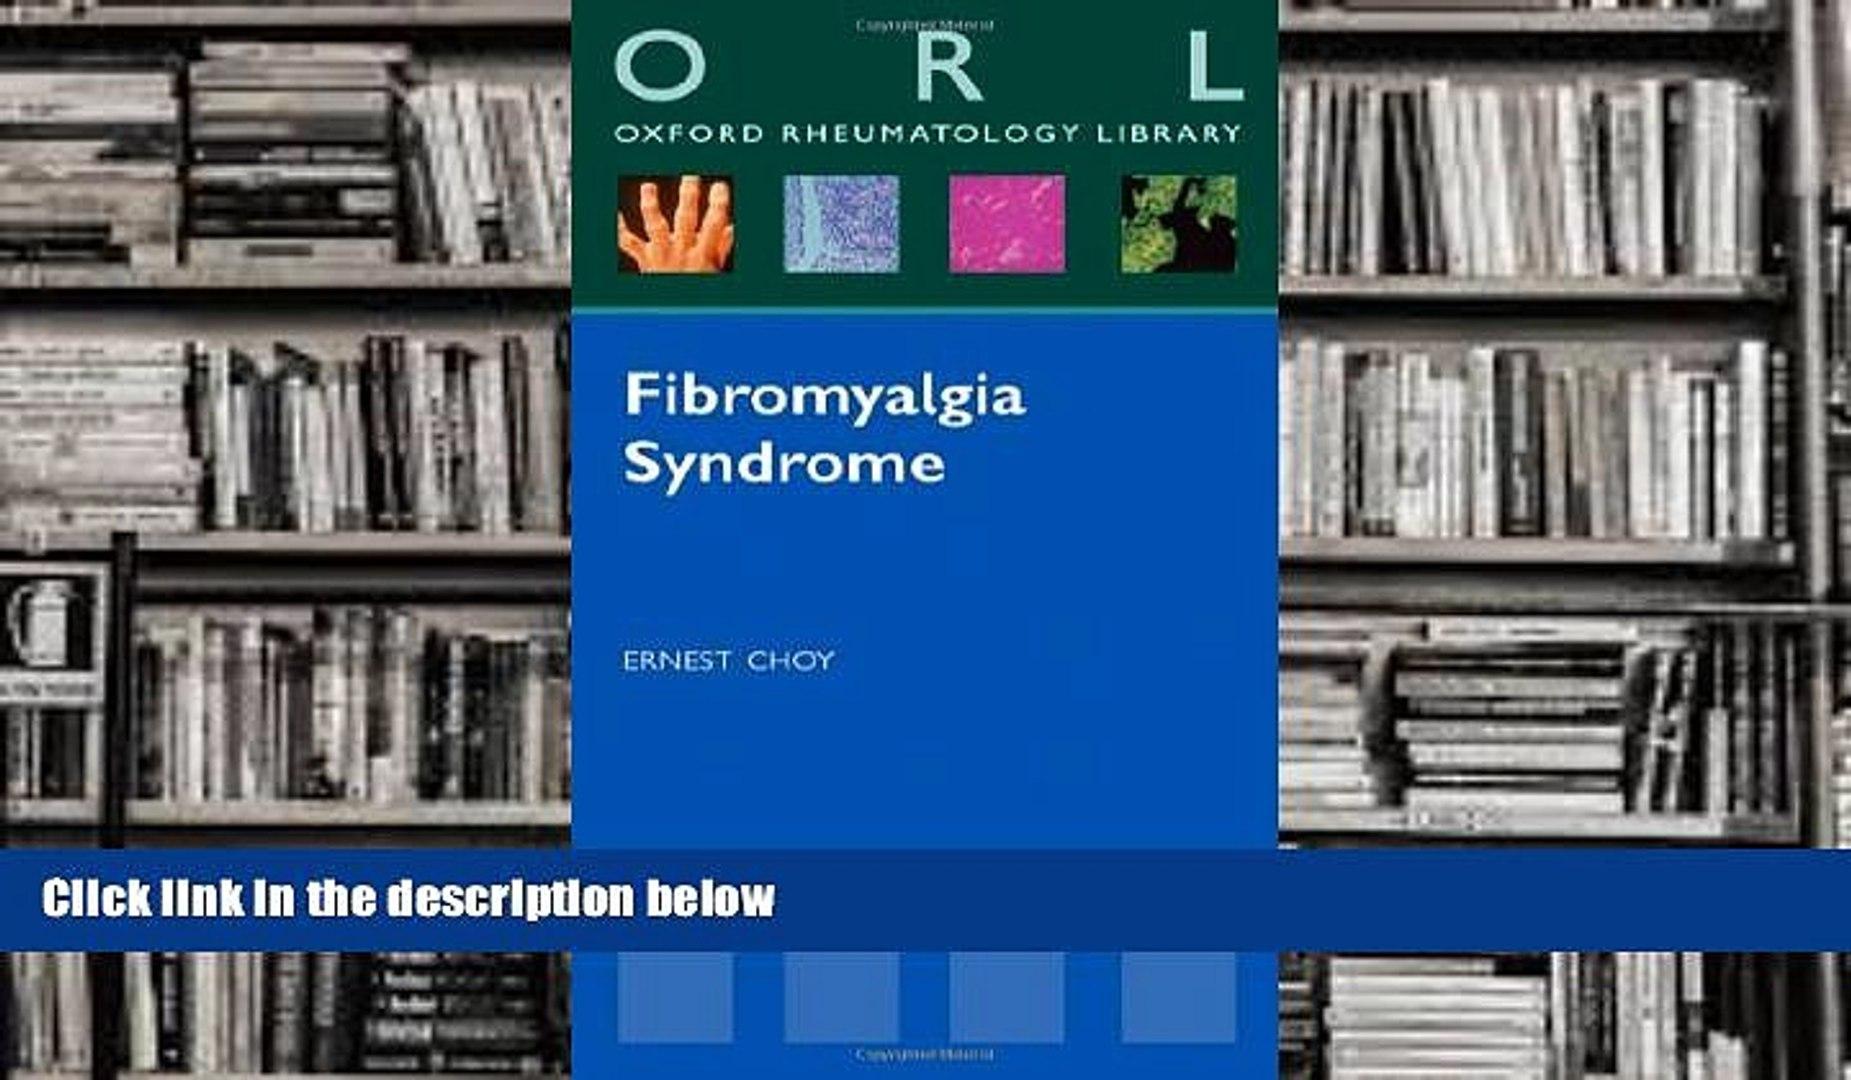 Read Online Fibromyalgia Syndrome (Oxford Rheumatology Library) Ernest Choy  Pre Order